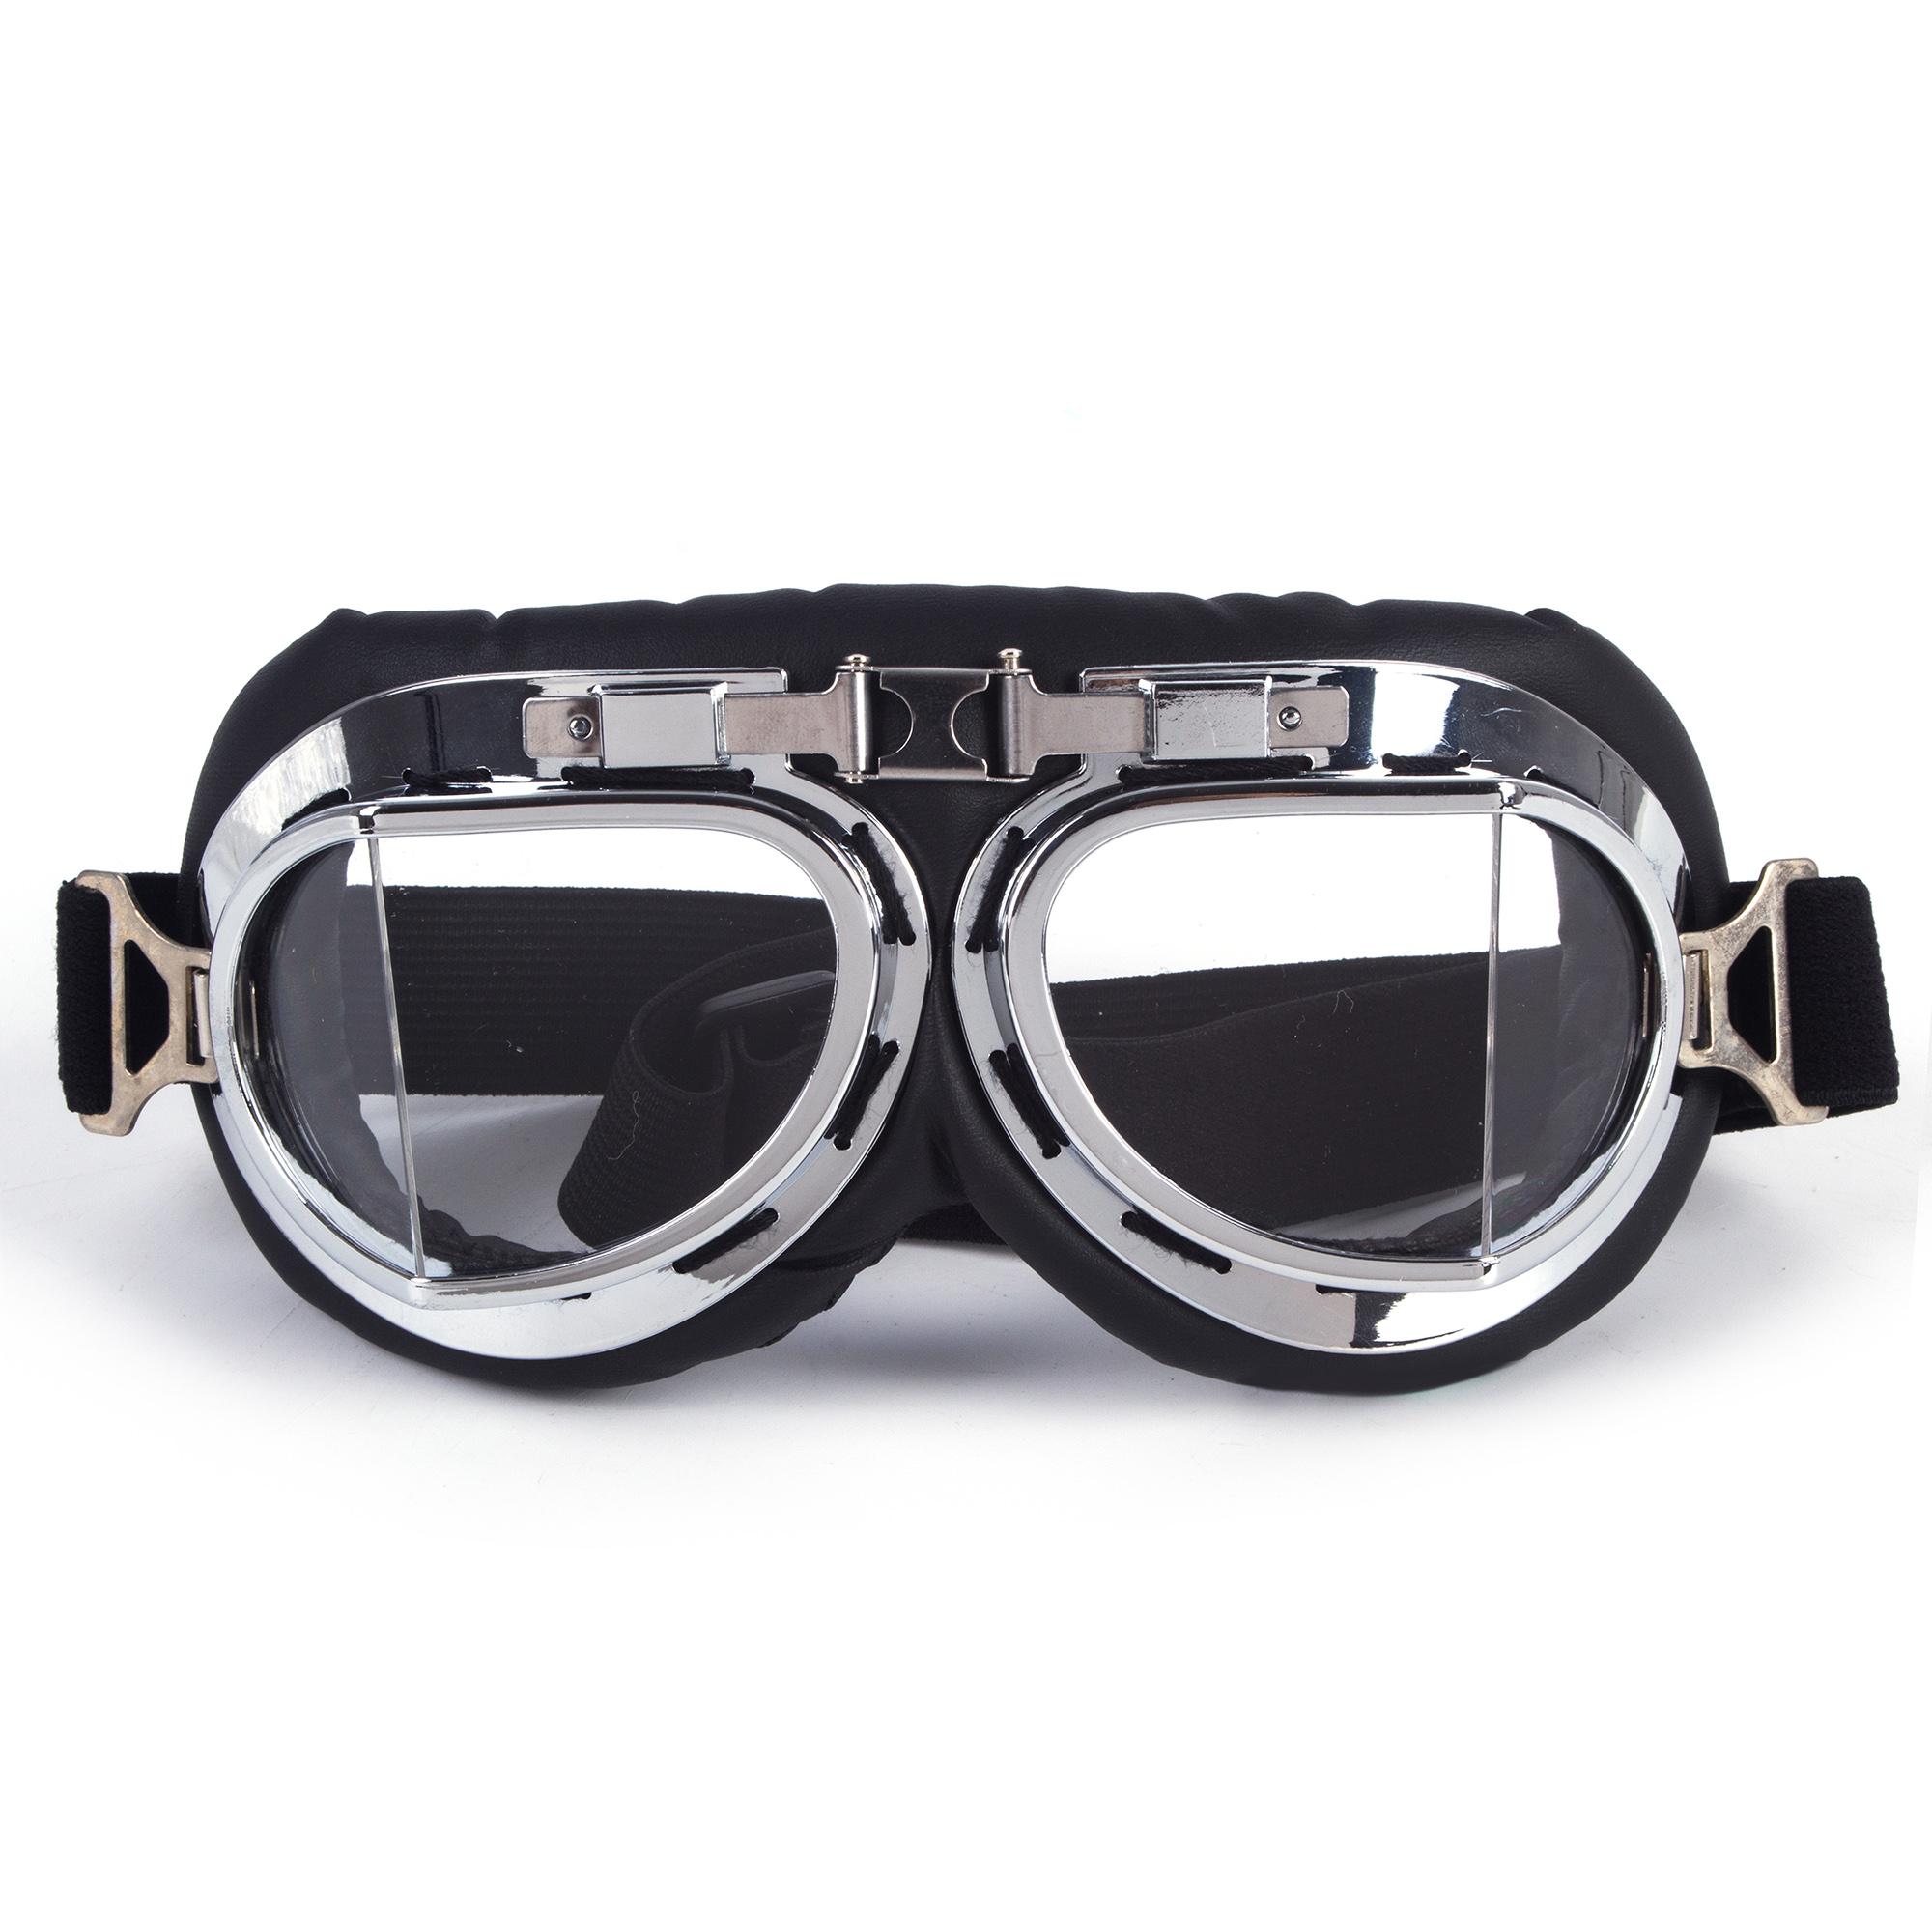 NK HOME Ski Goggles Over Glasses Ski/Snowboard Goggles Outdoor Sports UV Protection Sunglasses for Men and Women Black Blue